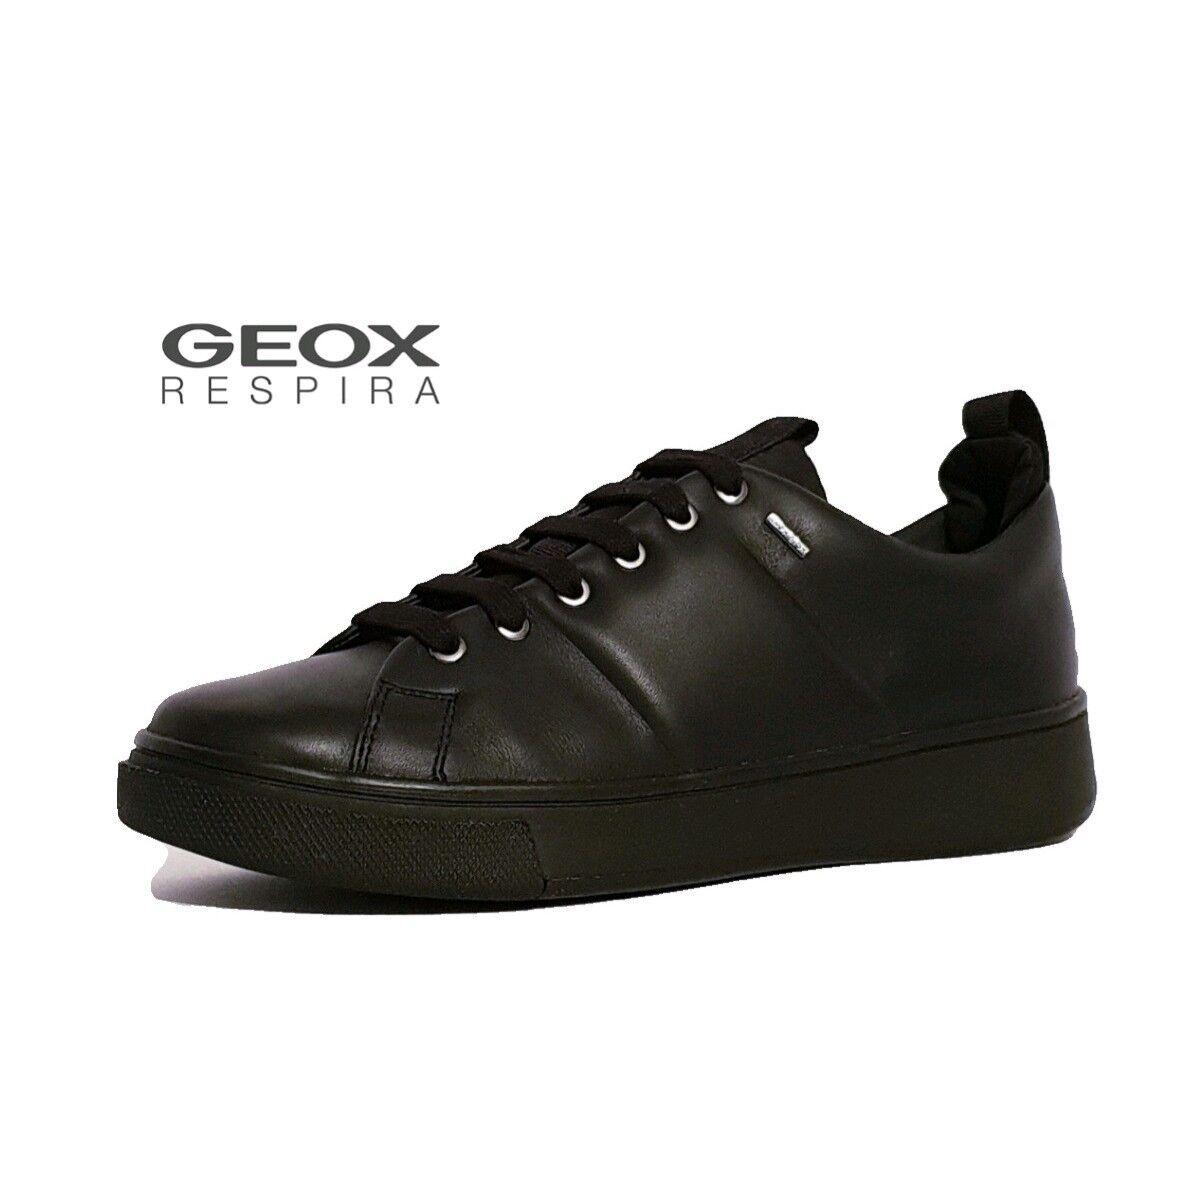 Geox amphibiox mayrah mayrah mayrah ABX Negro Cuero Impermeable Zapatillas Zapatos para mujeres damas  suministramos lo mejor